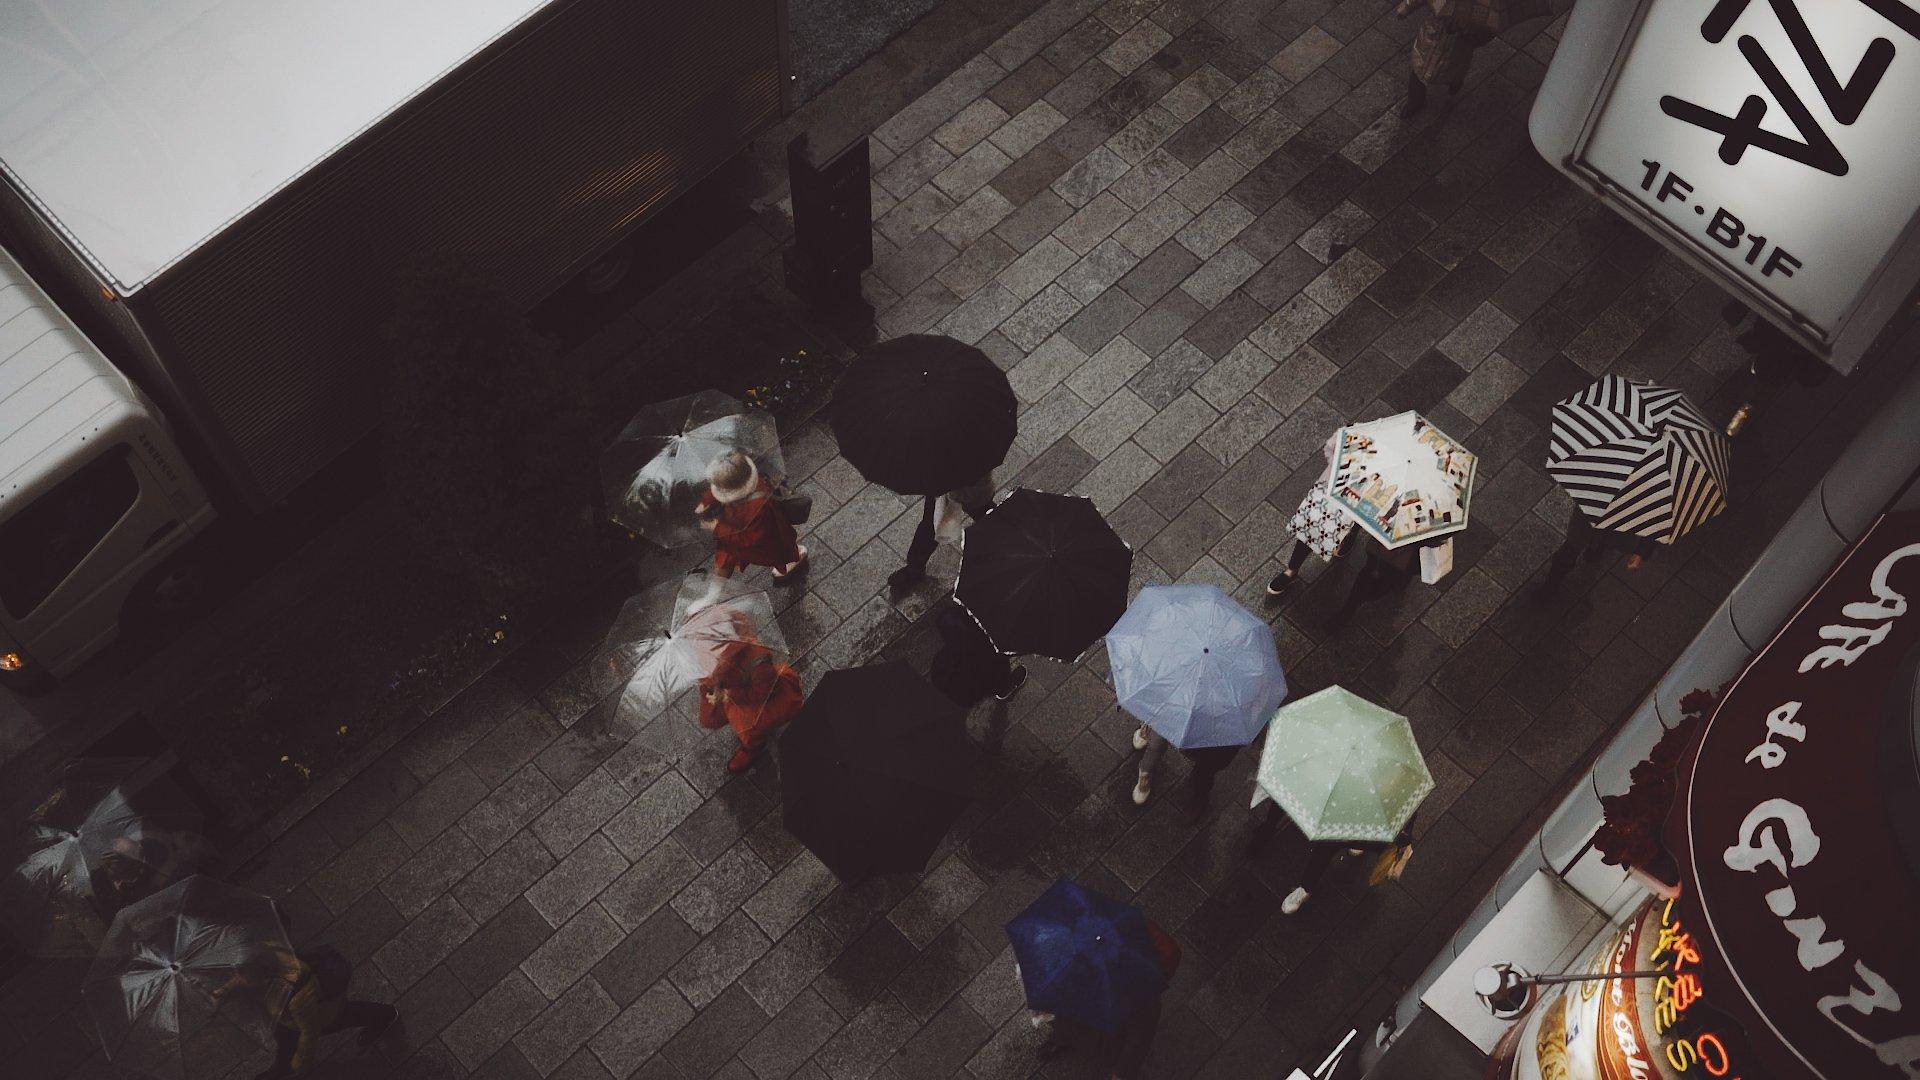 Tokyo Rain Cine Scenes S-Log2 Graded